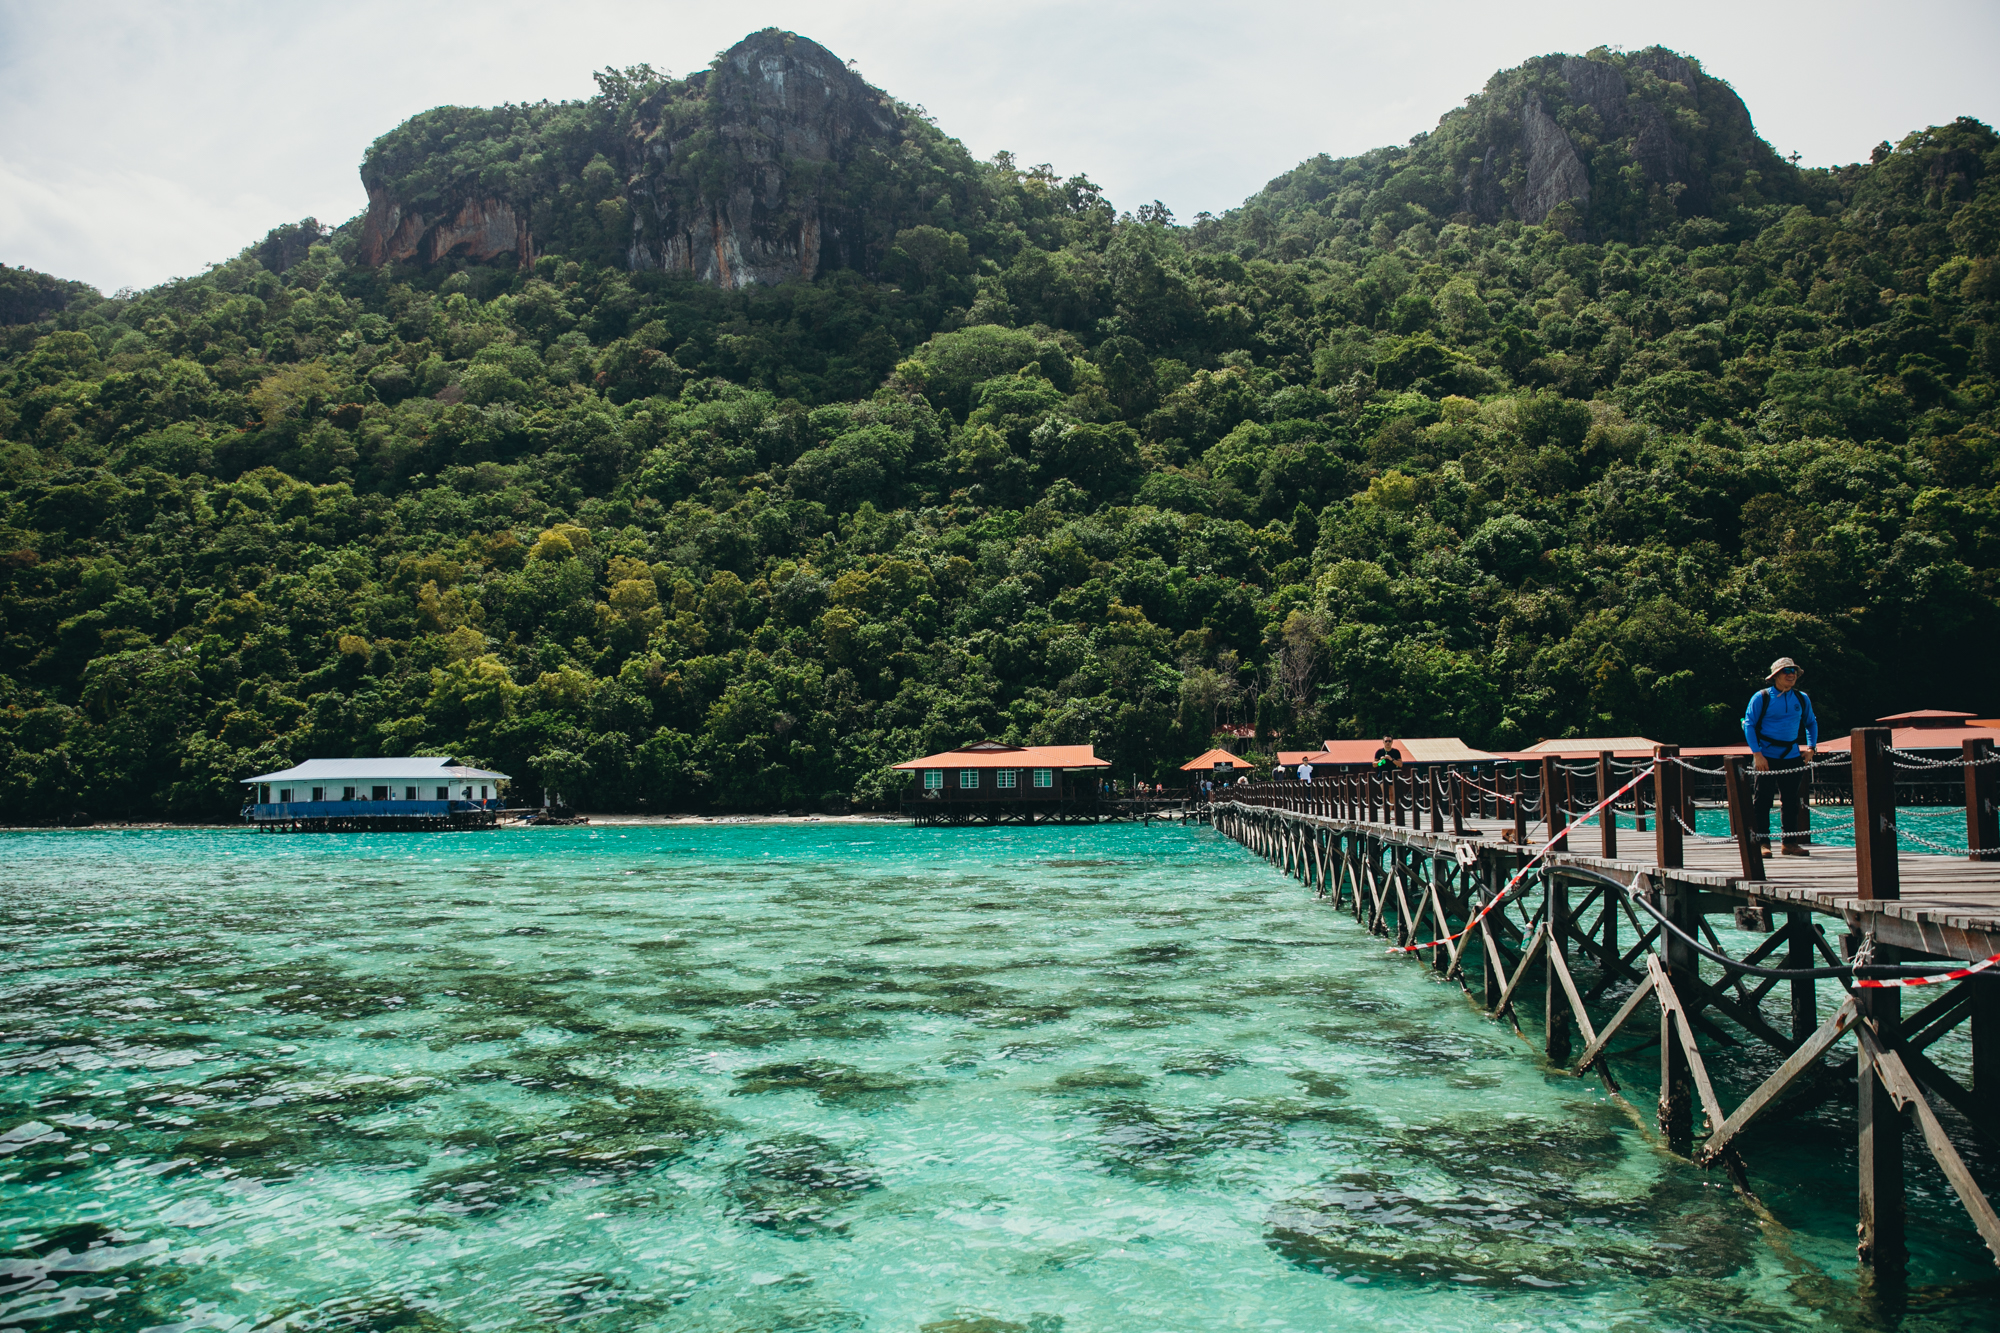 Borneo_HBGOODIE2018 (28 of 38).jpg